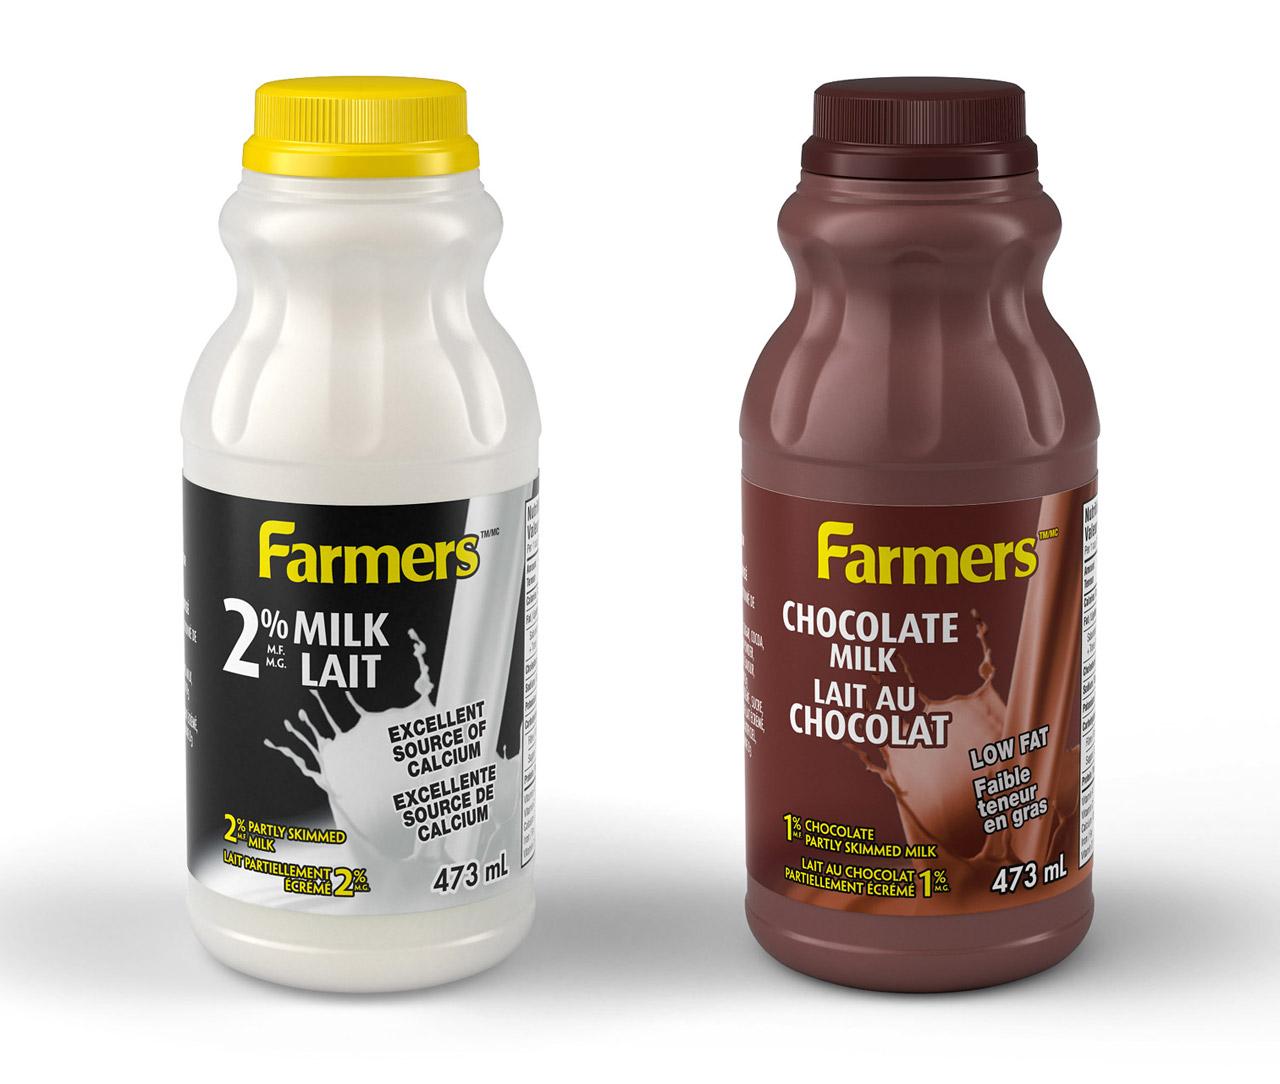 Product rendering: Milk bottles